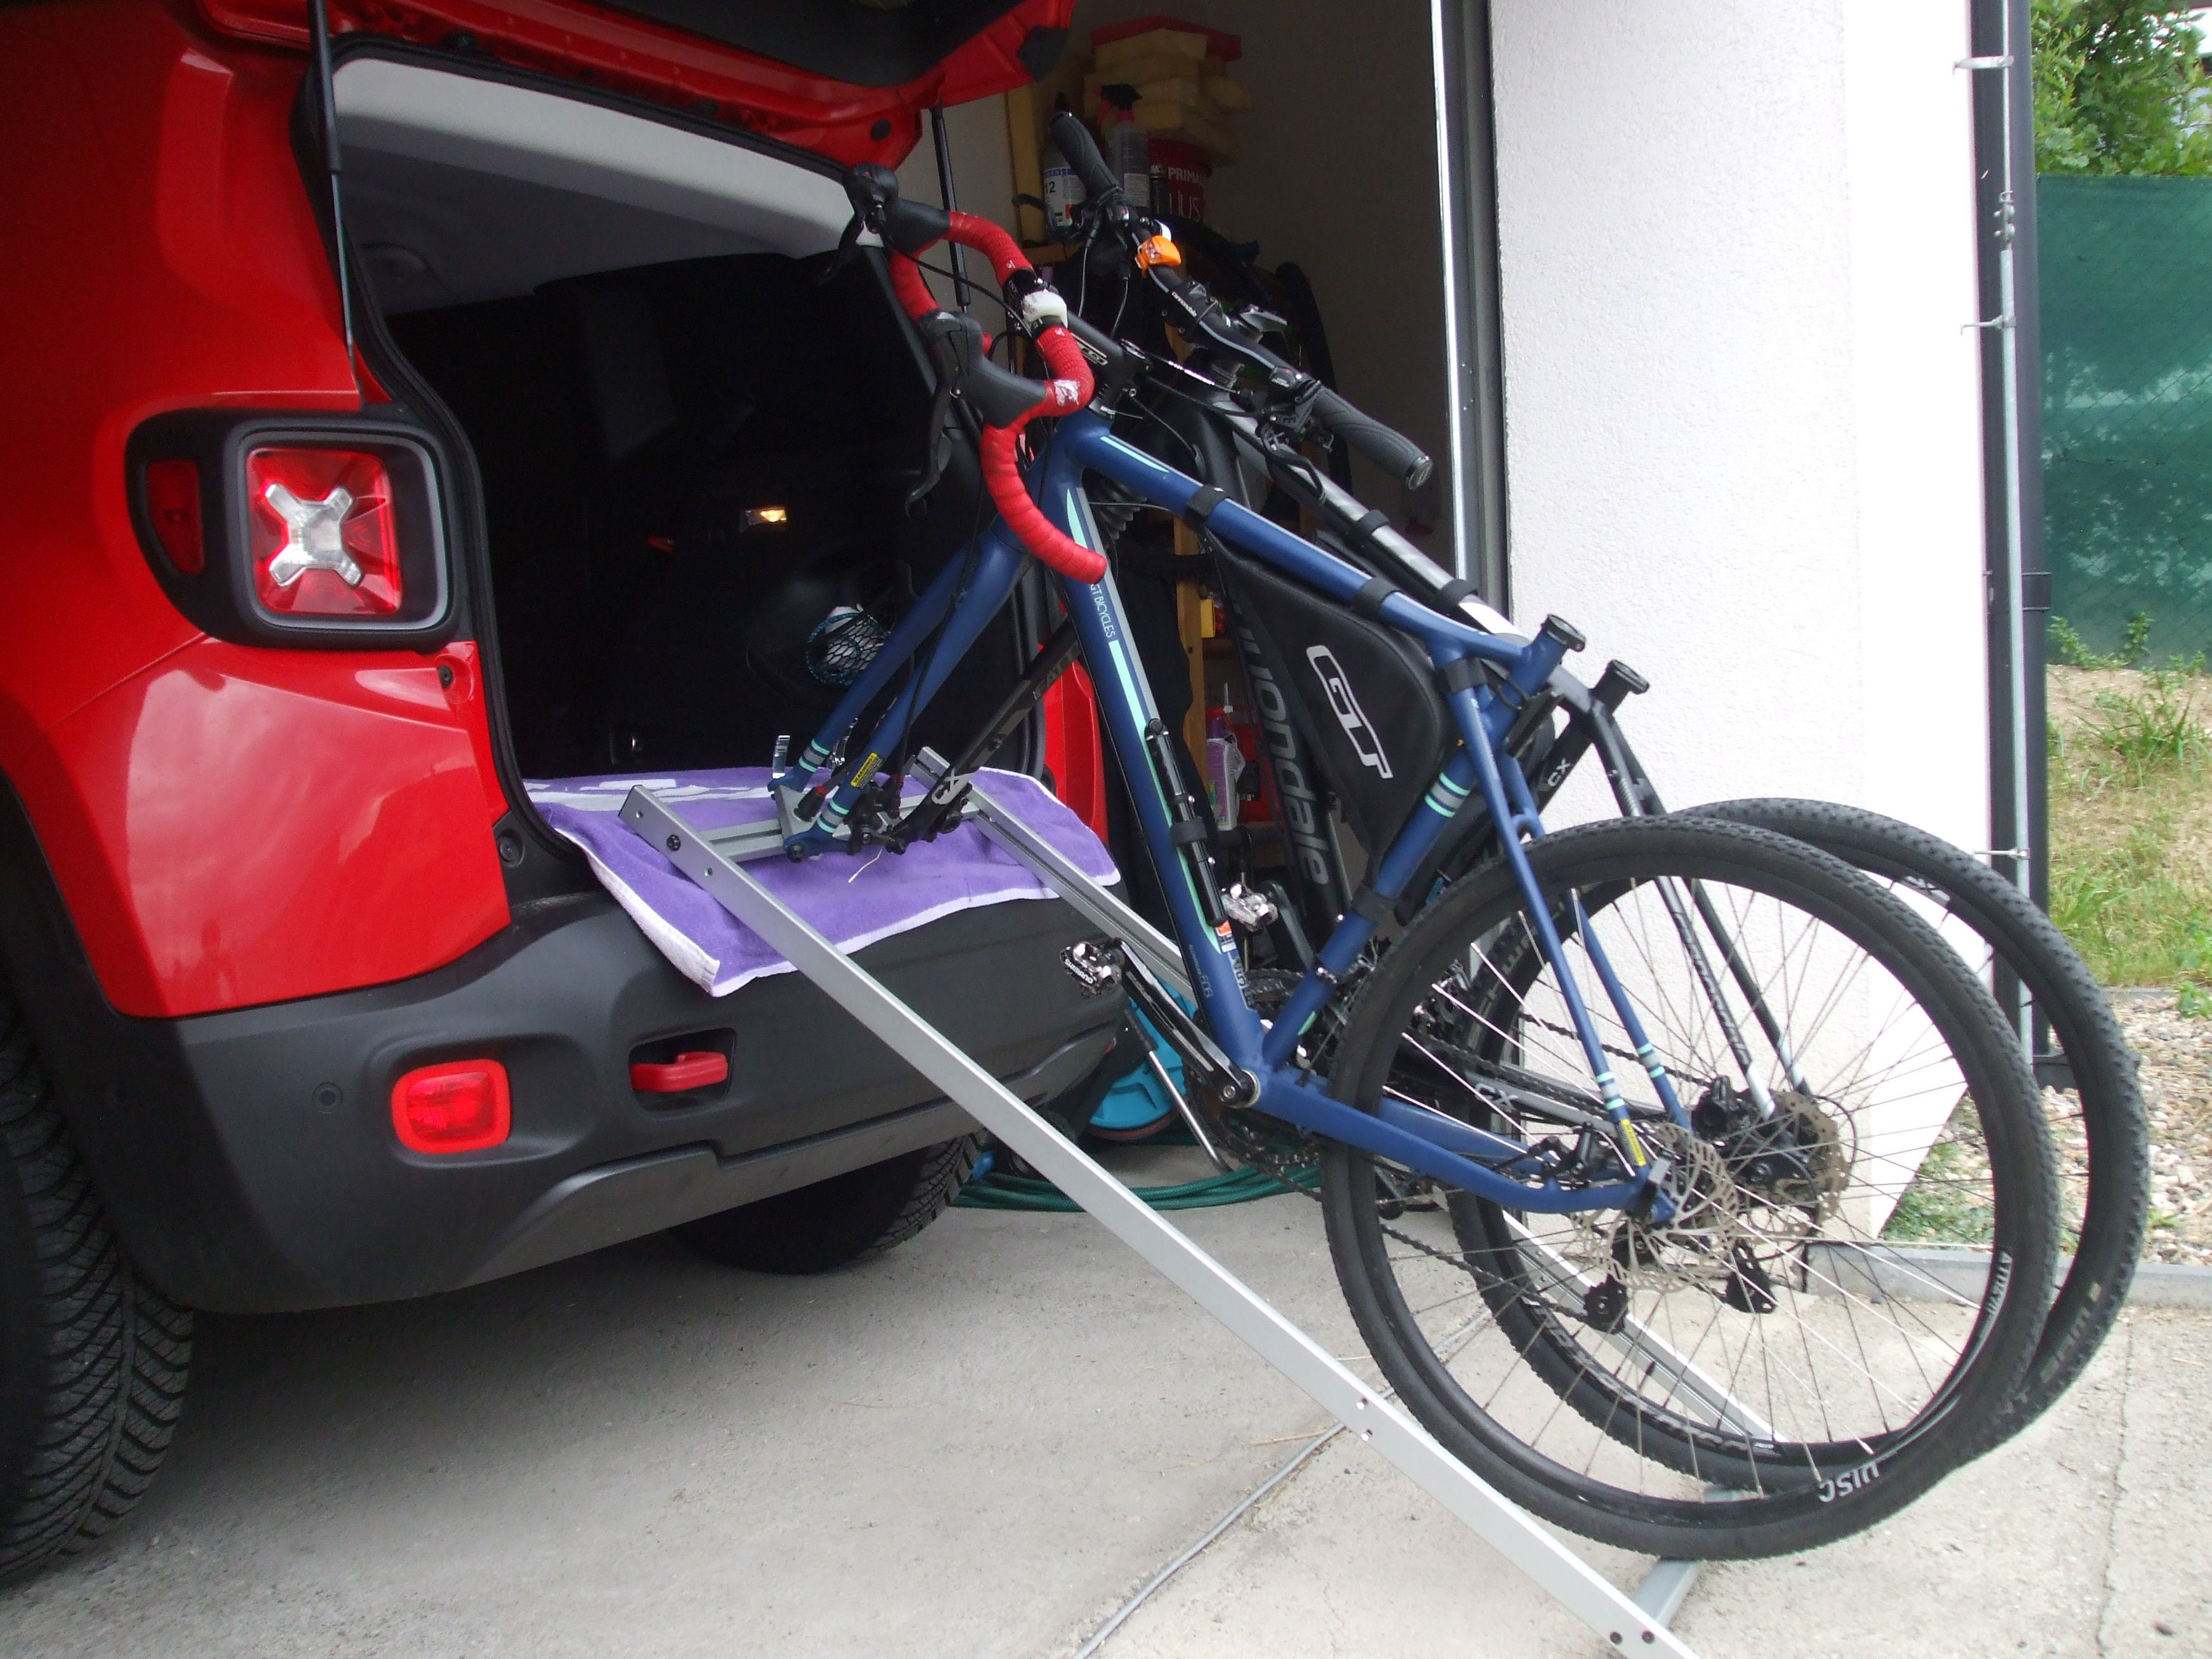 Pin By Franta Vostarek On Jeep Renegade Trailhawk Bikes